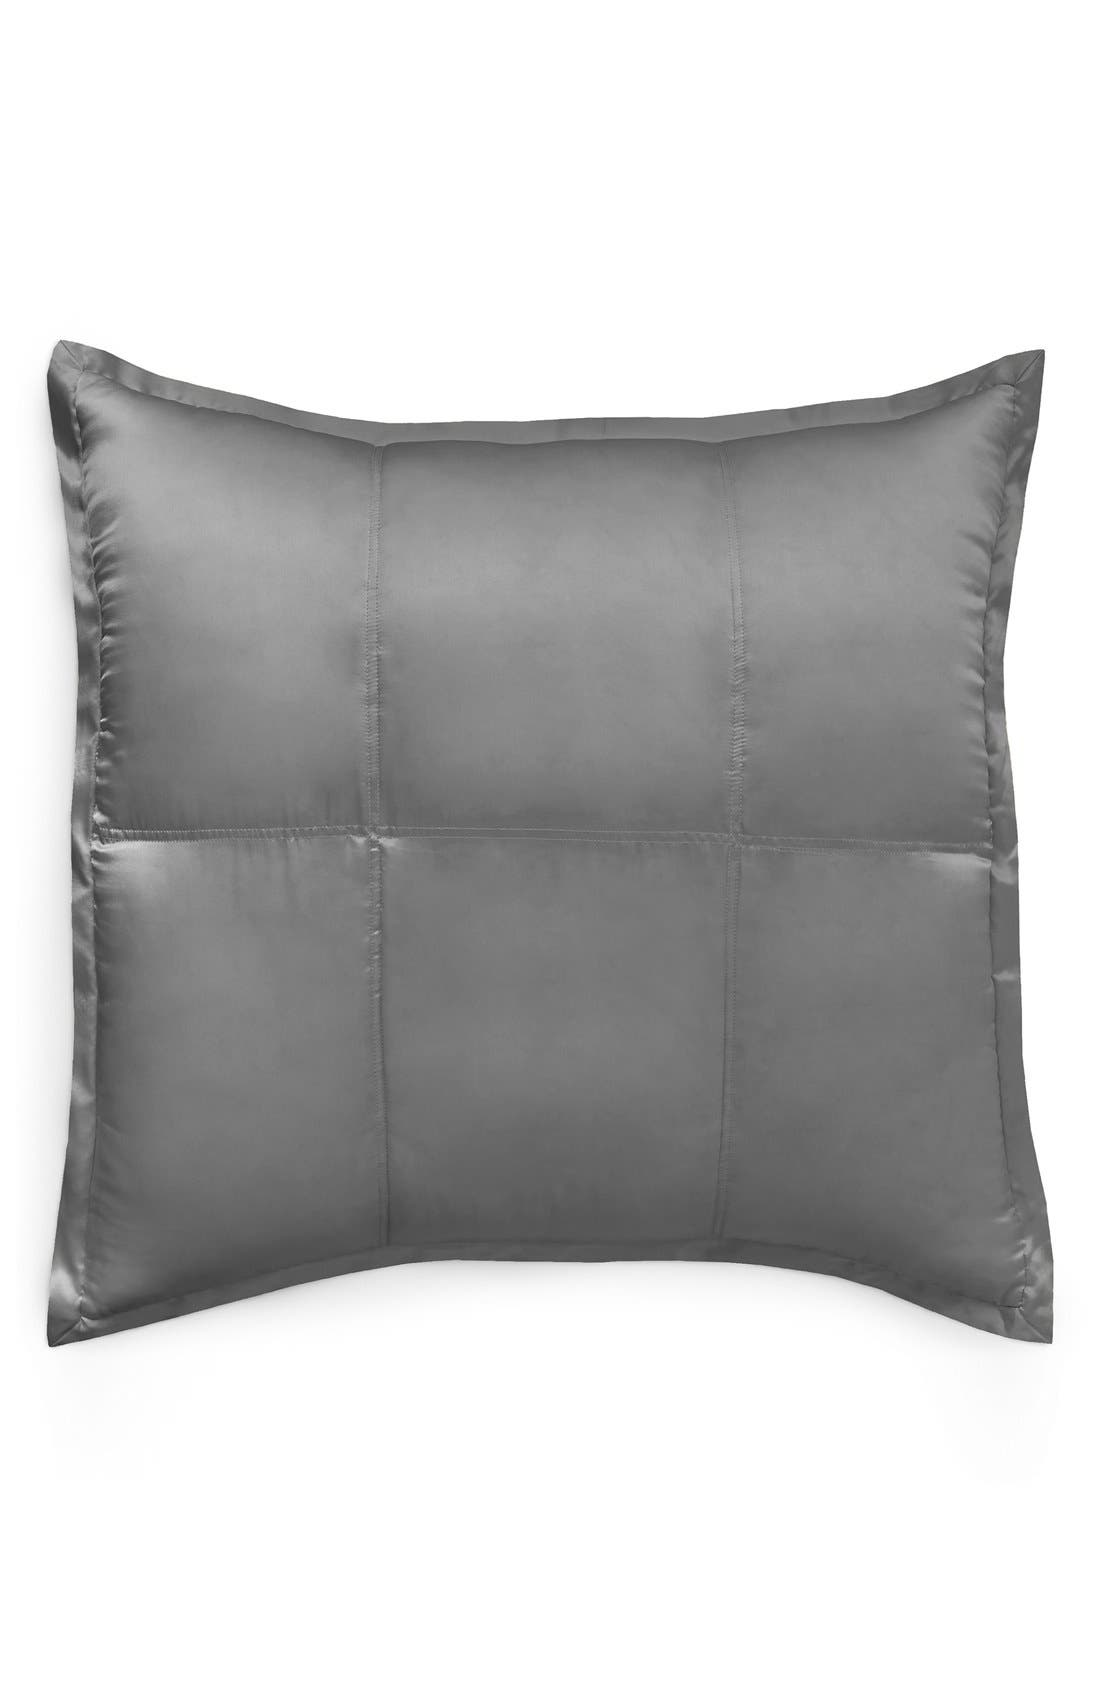 Donna Karan Collection 'Surface' Silk Charmeuse Euro Pillow Sham,                             Main thumbnail 1, color,                             CHARCOAL